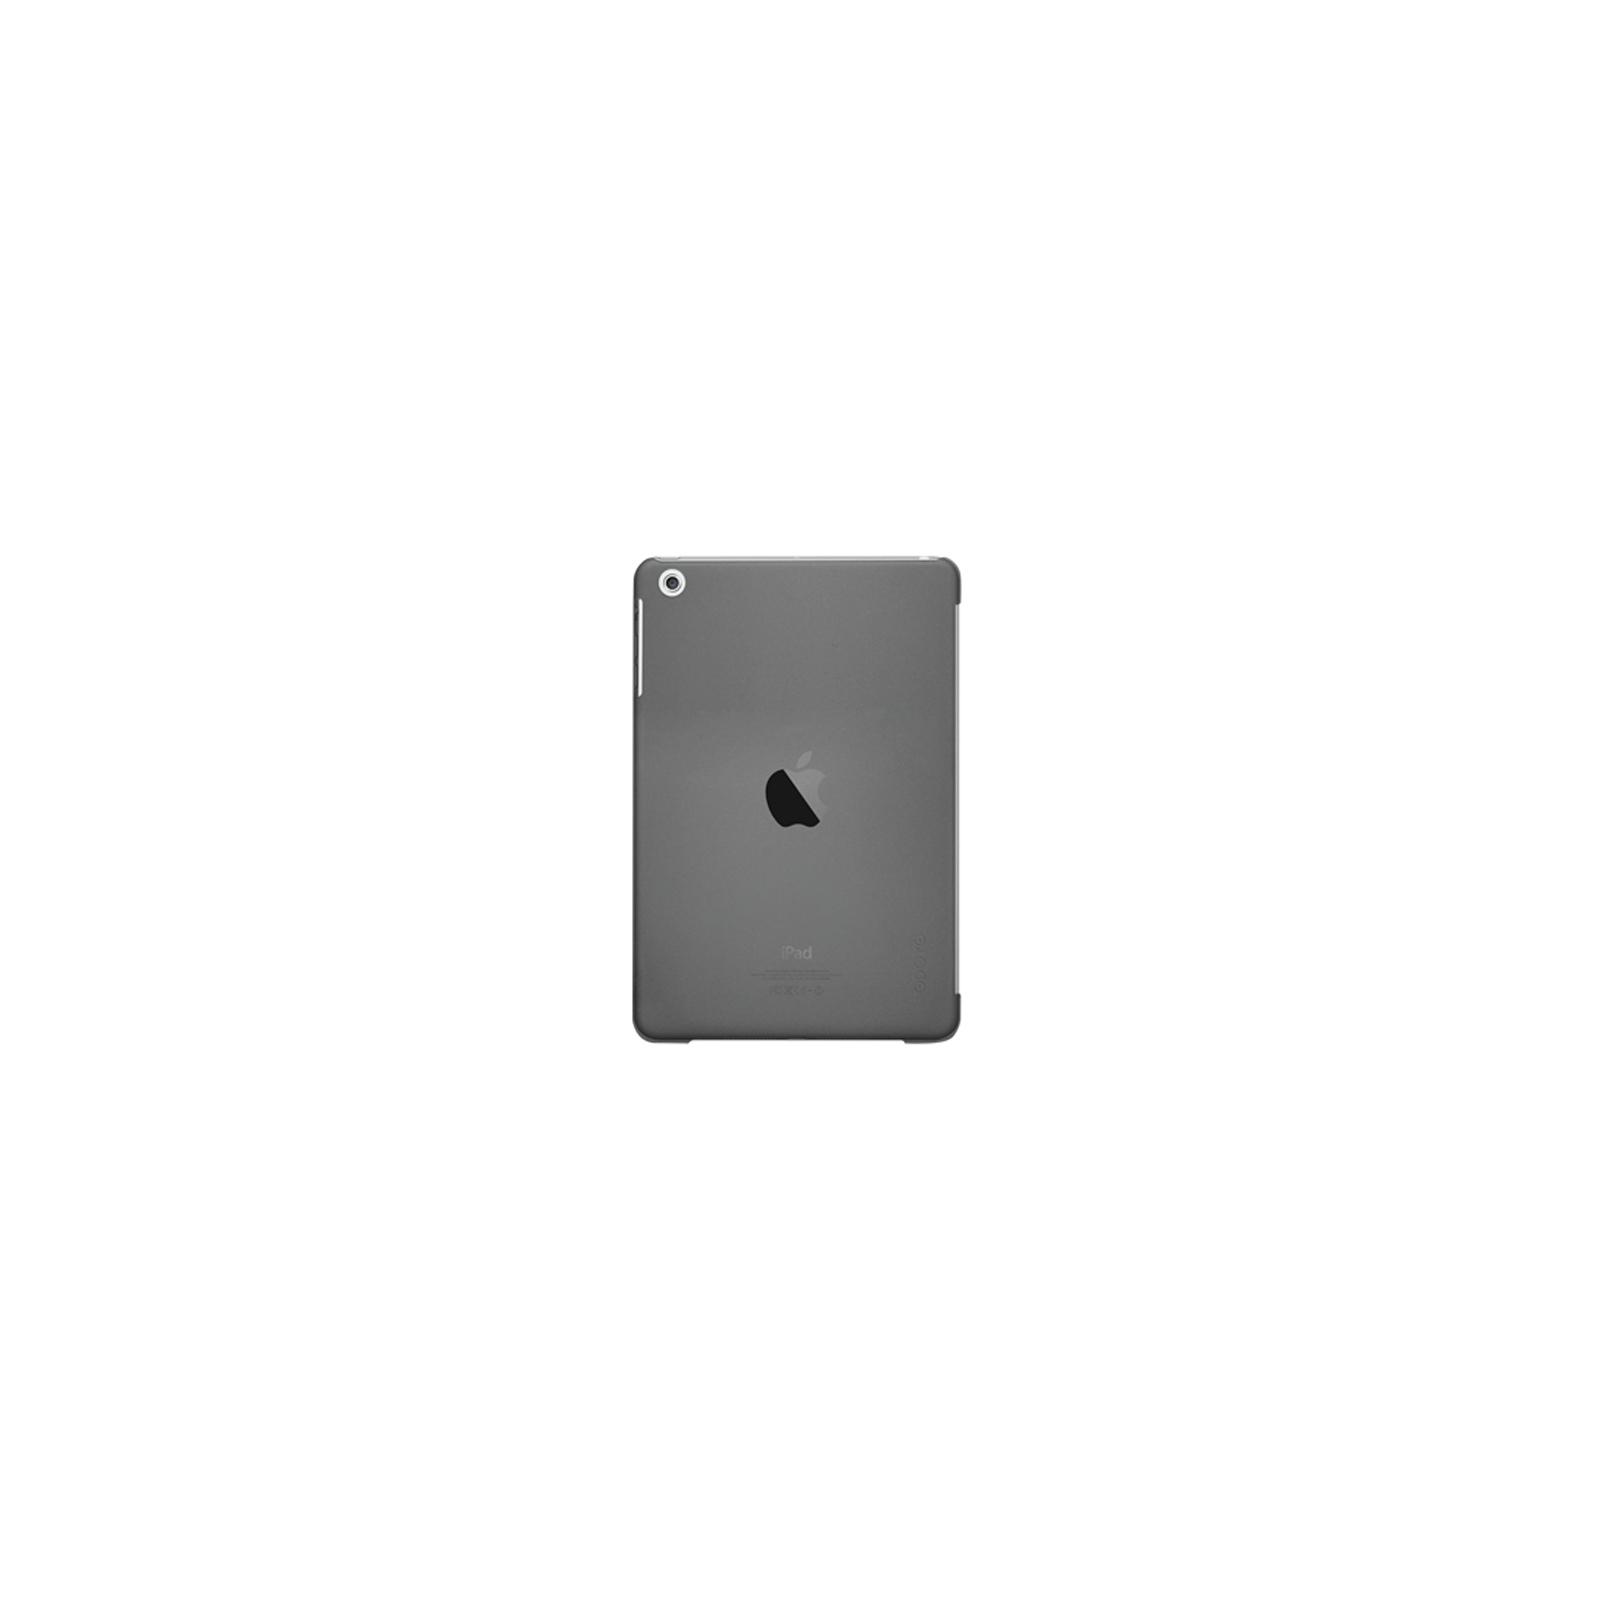 Чехол для планшета ODOYO IPAD MINI /SMARTCOAT Black (PA521BK)